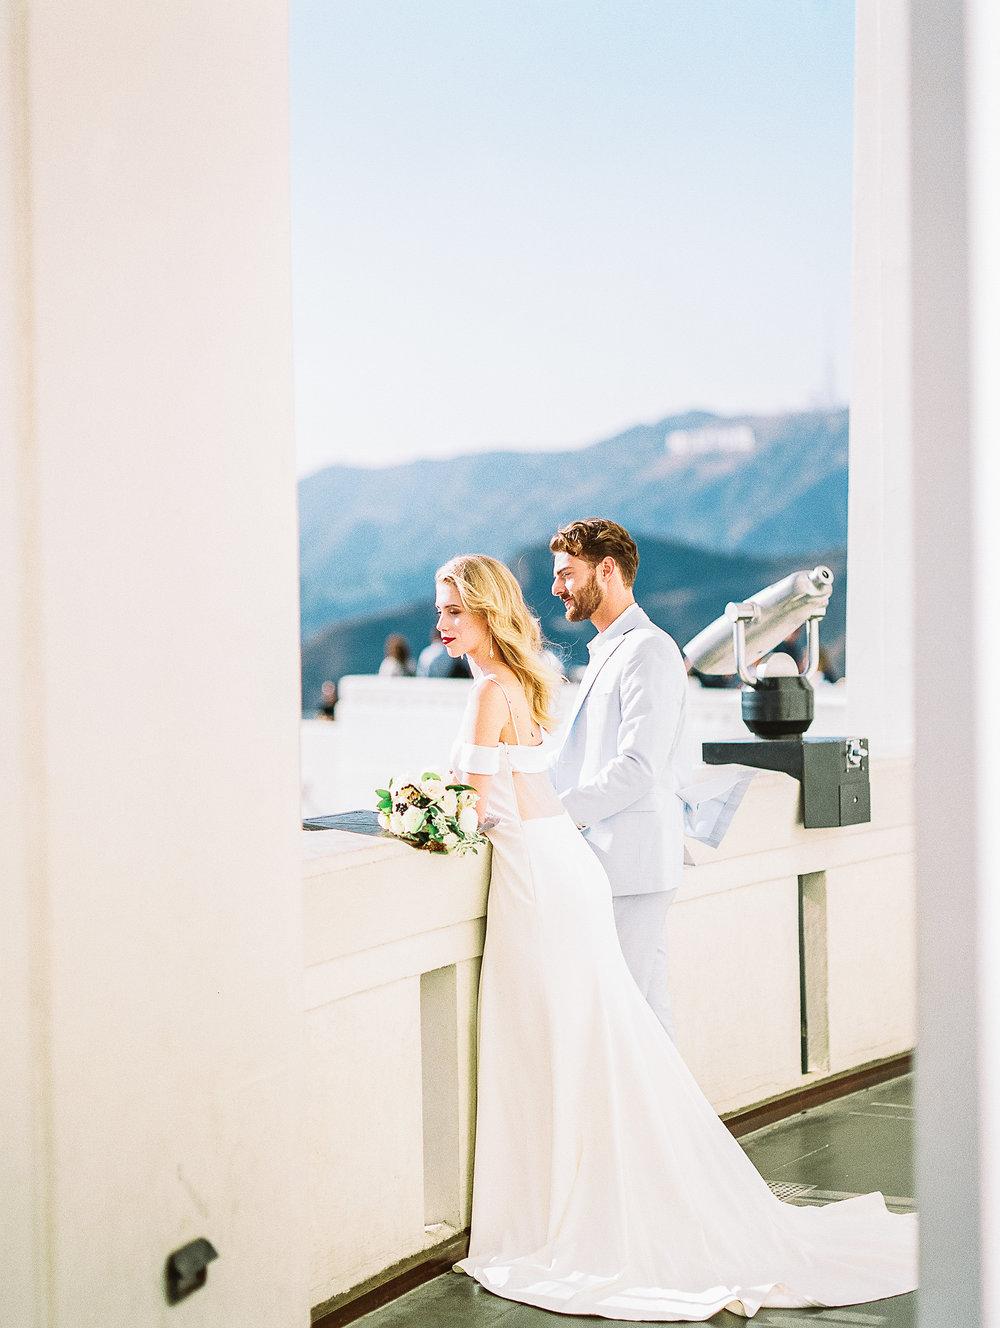 LA-Wedding-Shoot-by-JBJ-Pictures-314.jpg